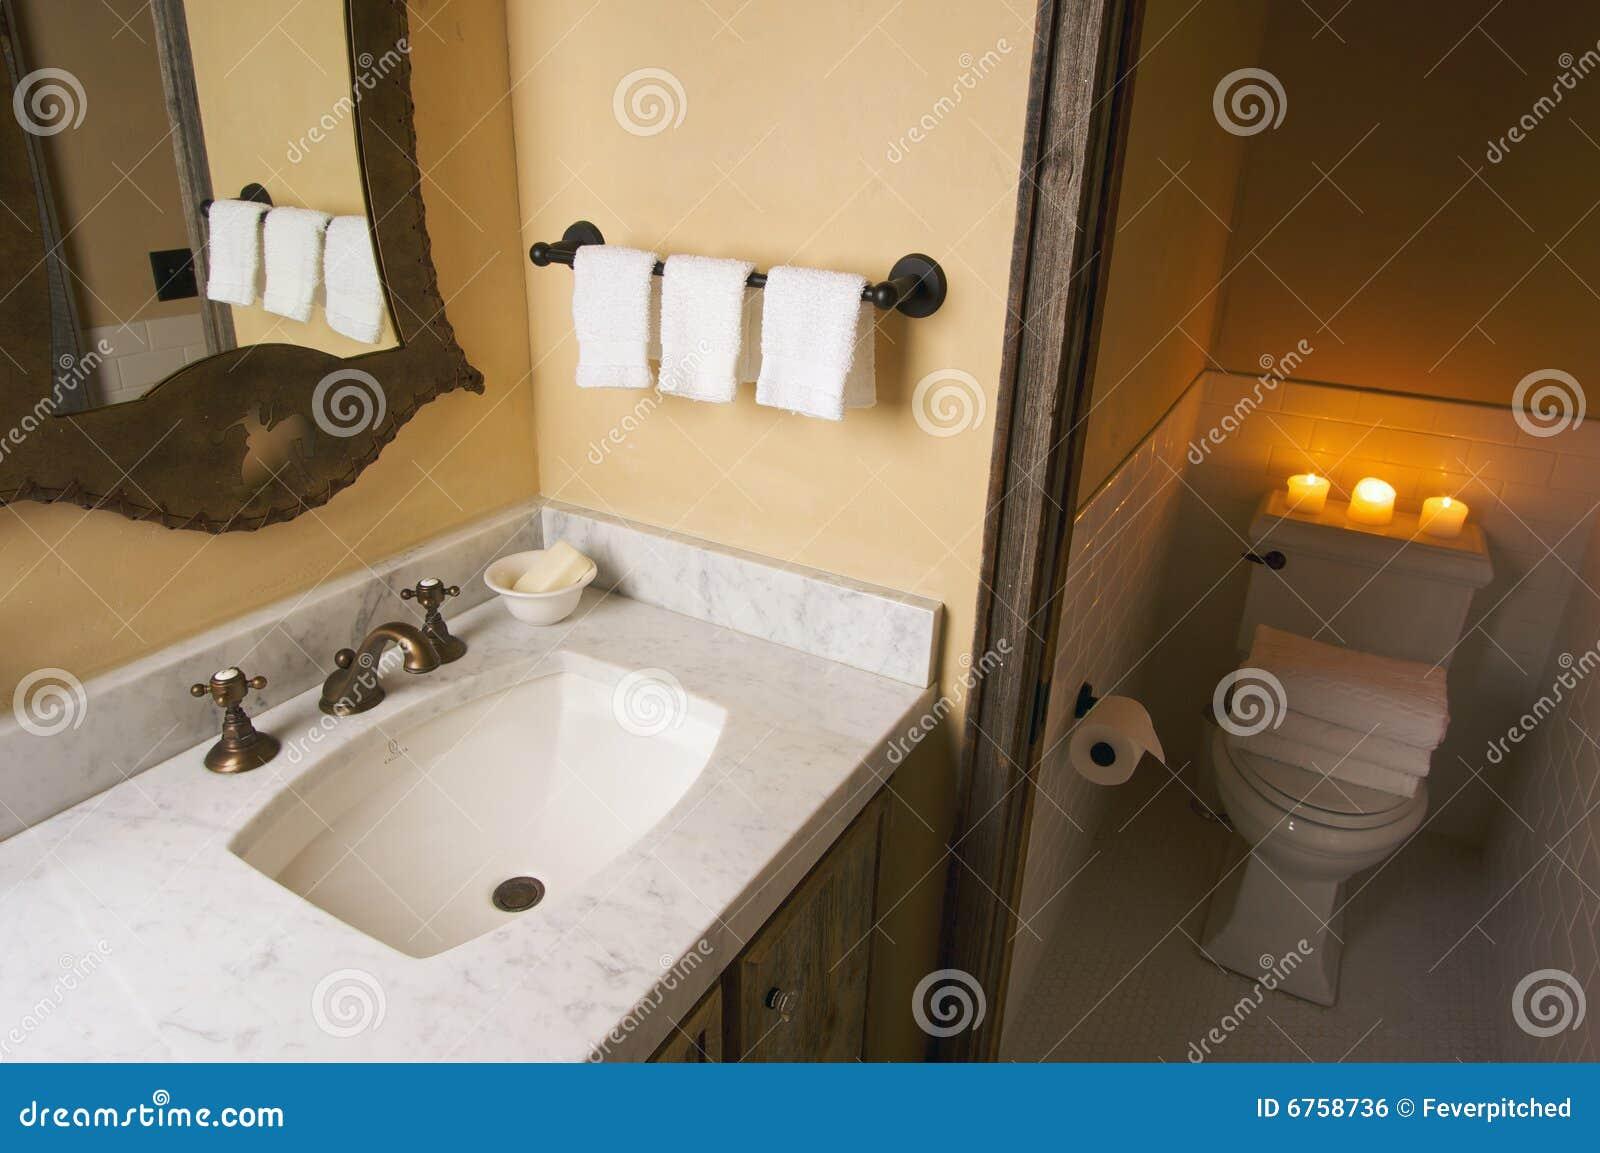 Rustic bathroom scene stock photo image of ceramic soap for Bathroom scenes photos